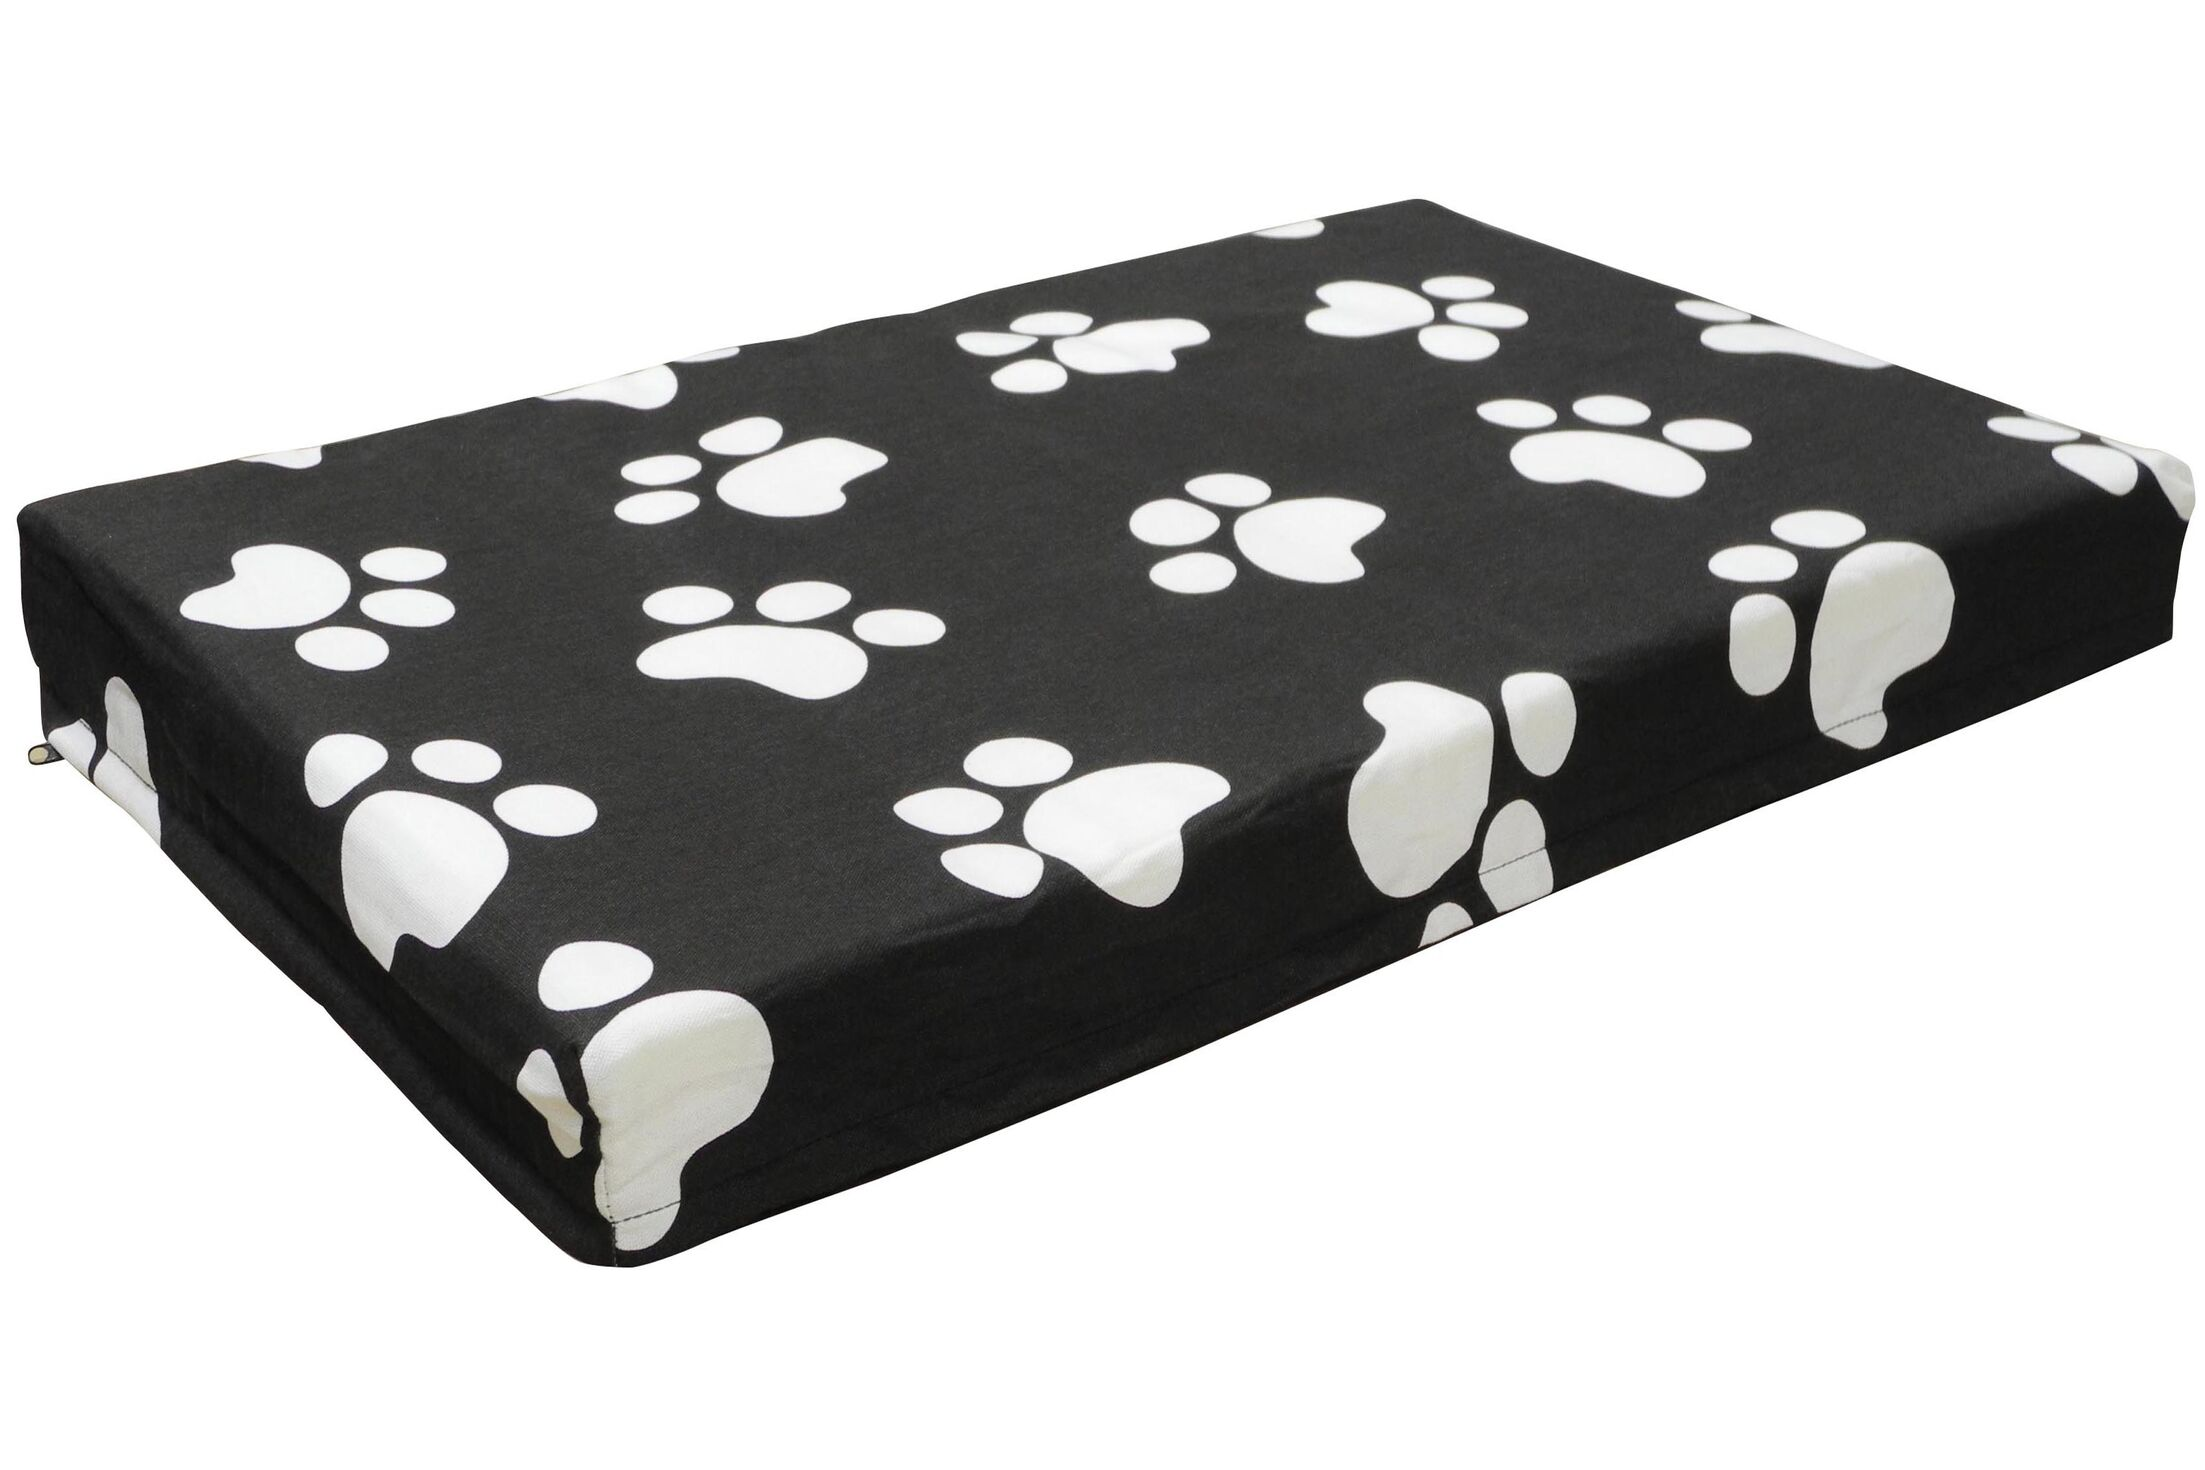 Memory Foam Orthopedic Pillow Dog Bed Size: Large (3